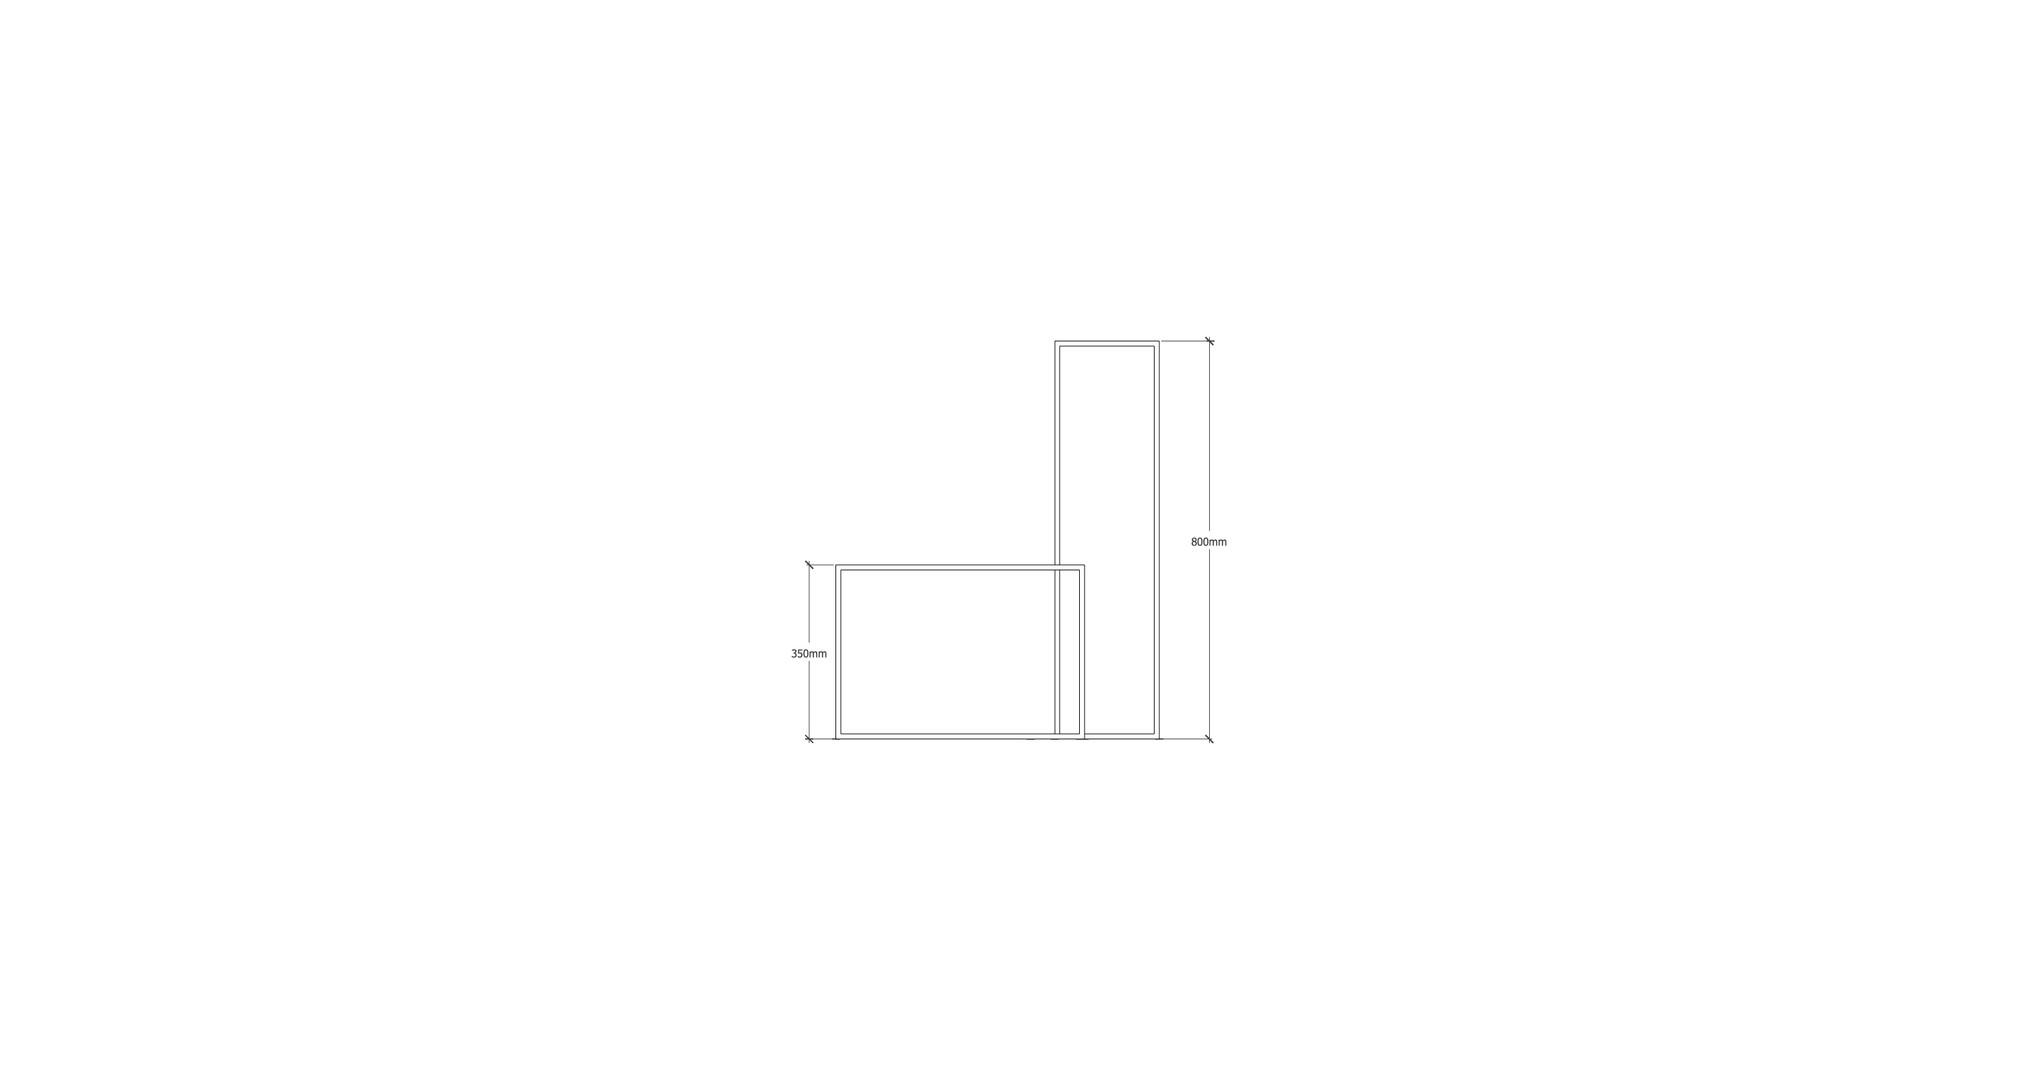 Final Piece_elevation.jpg